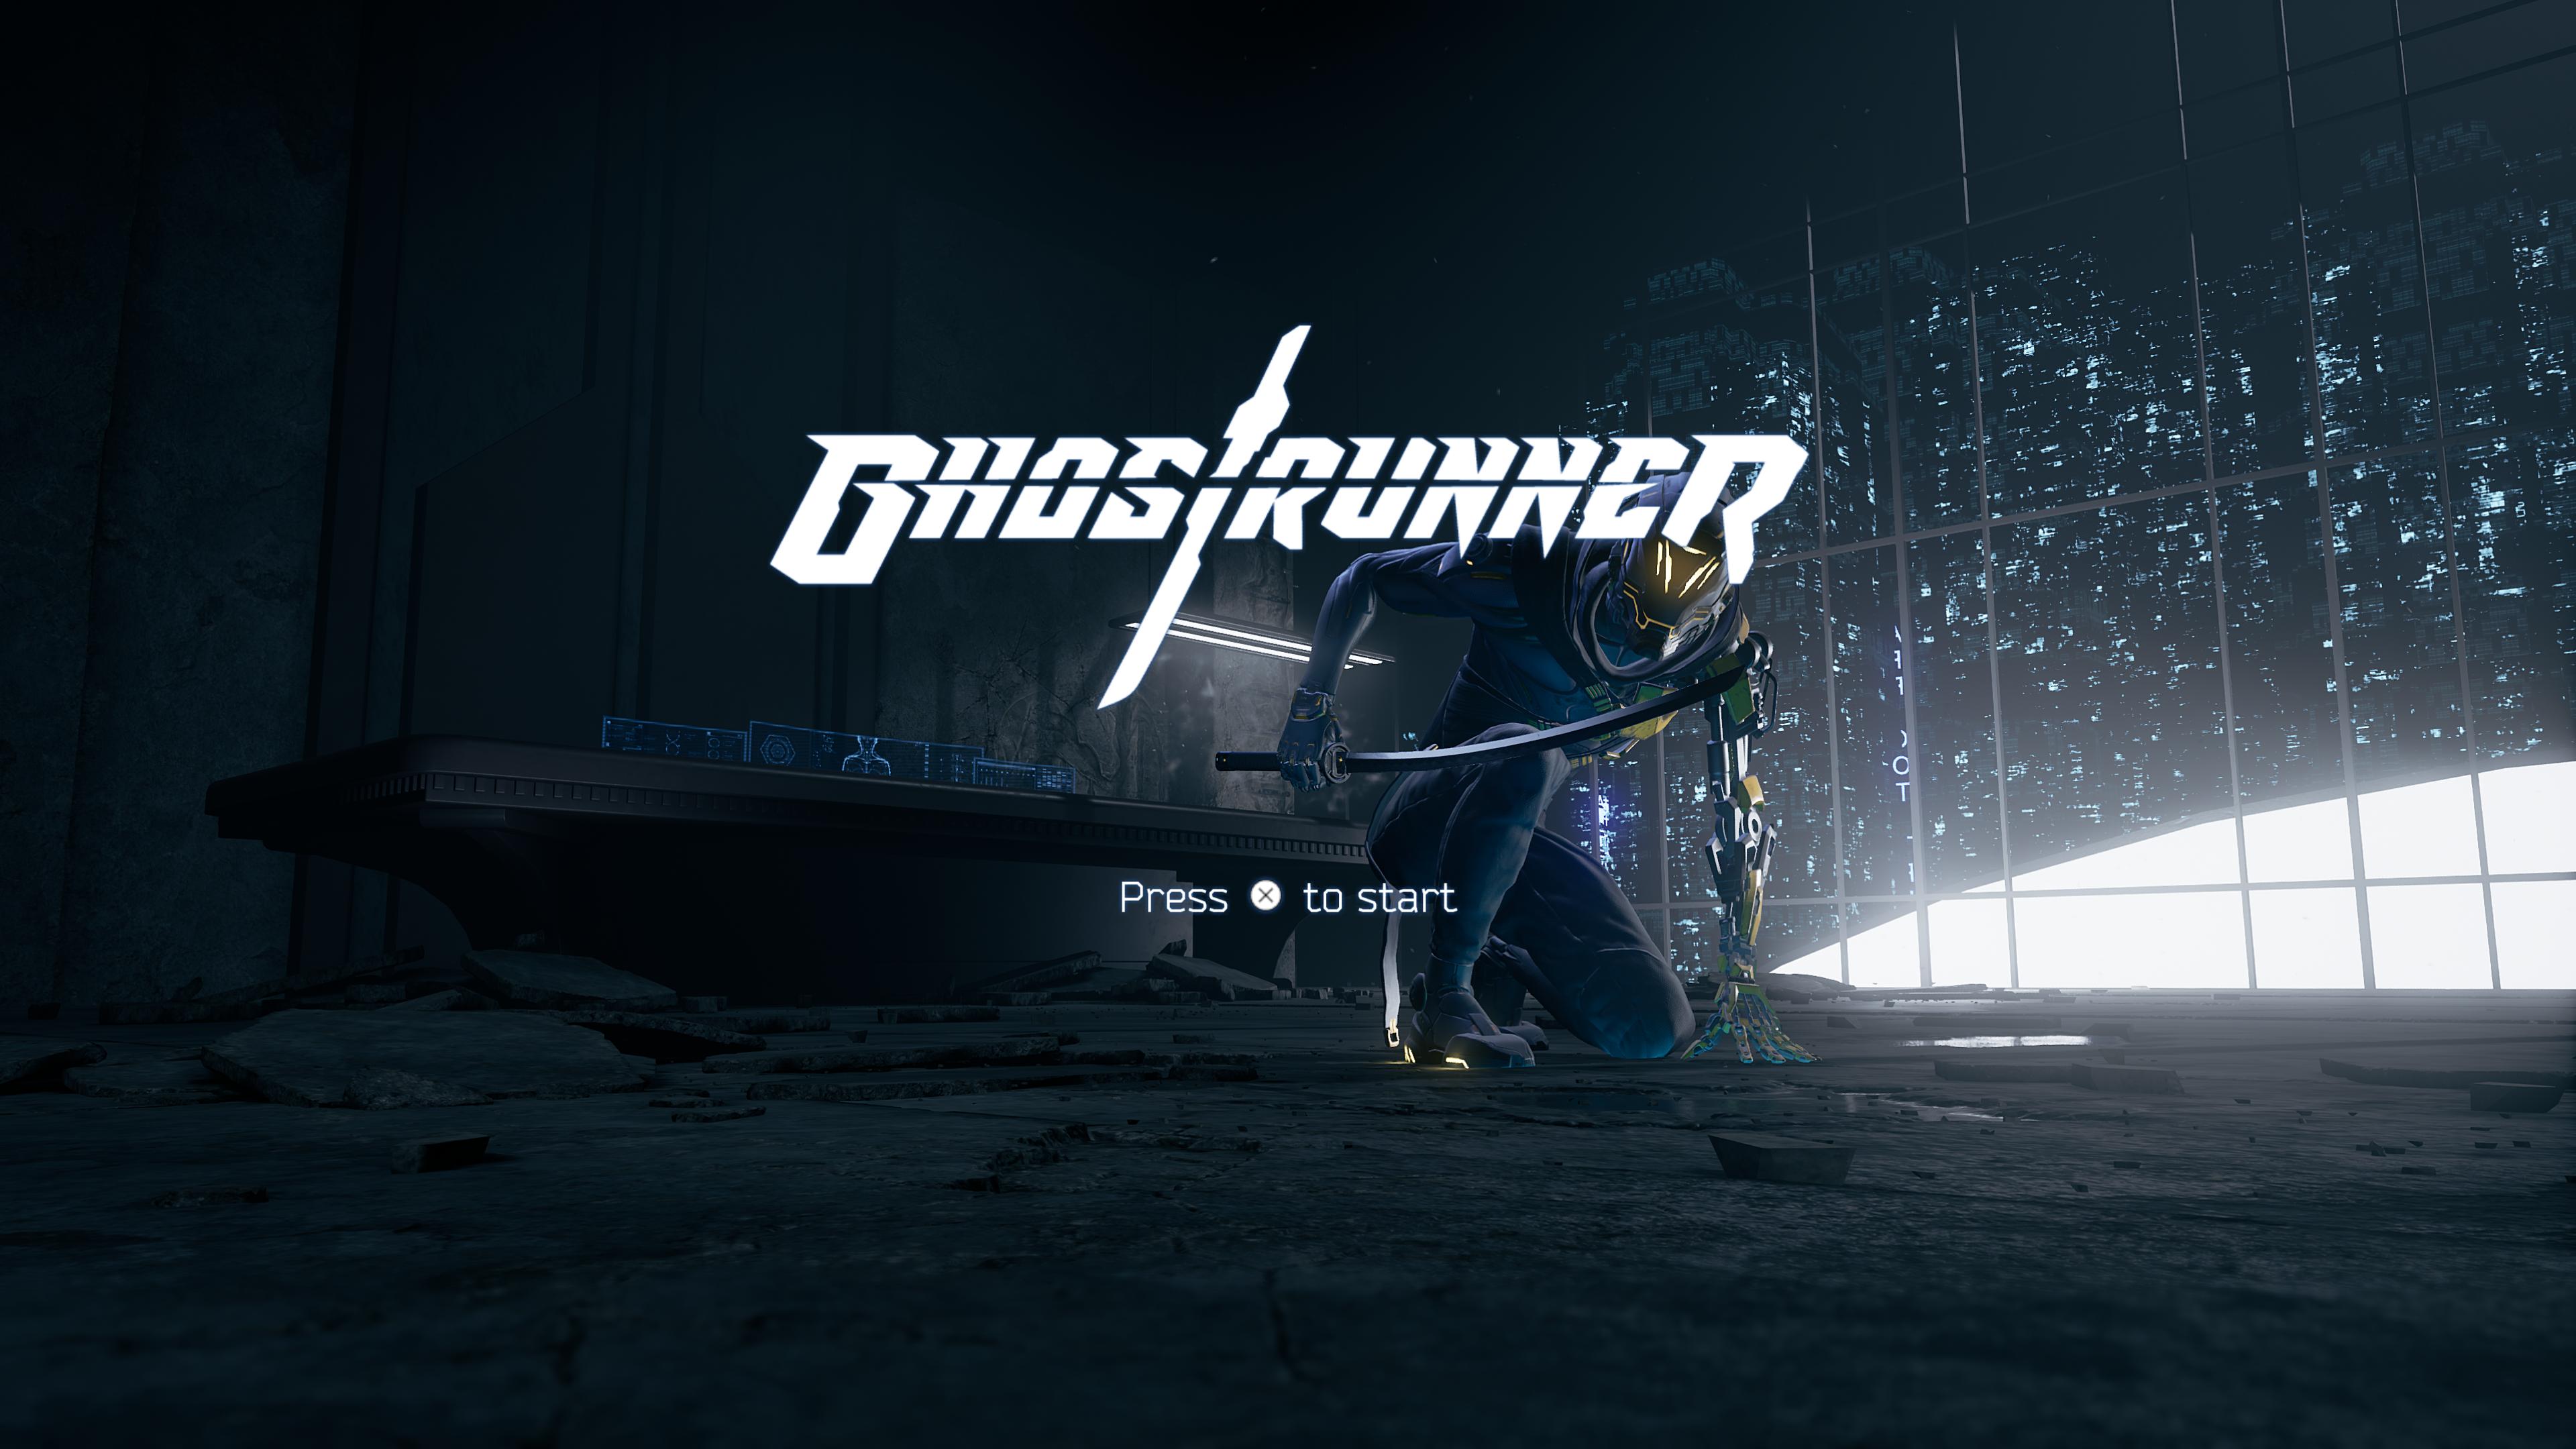 Ghostrunner - ekran tytułowy